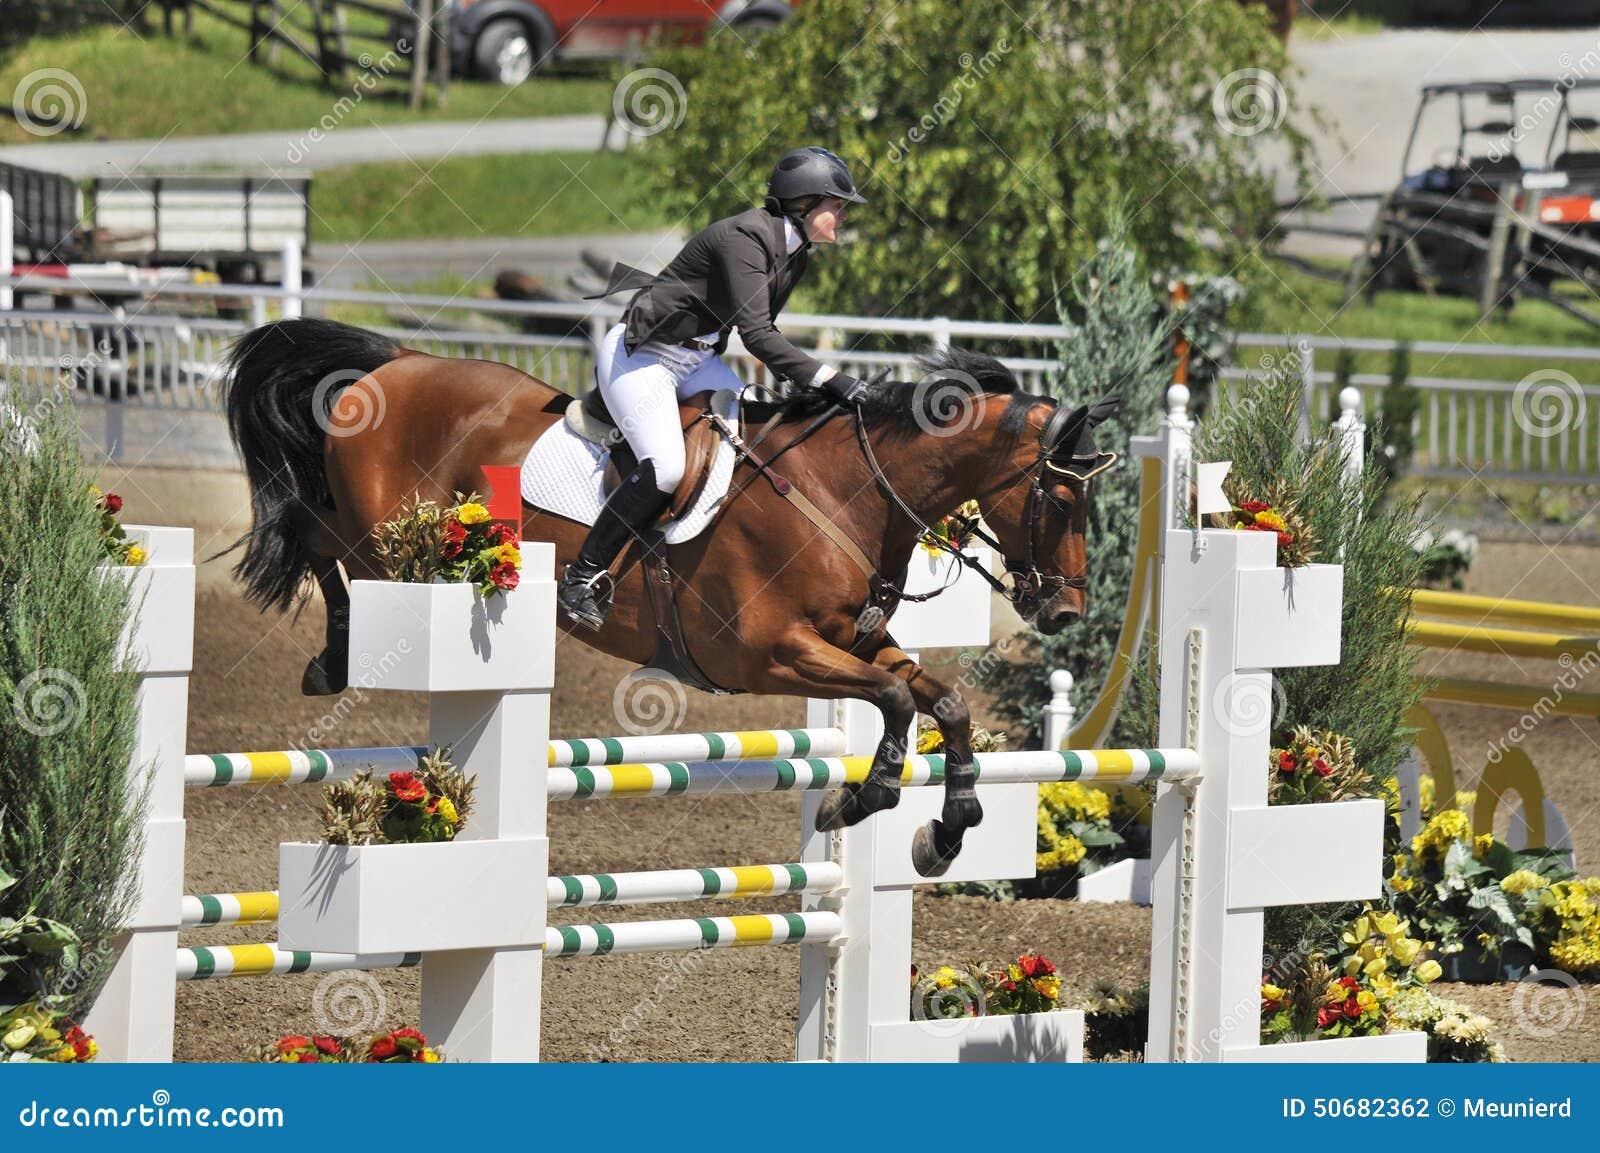 Download 国际BROMONT 图库摄影片. 图片 包括有 7月, 疾驰, 飞跃, 国际, 农场, 蒙特利尔, 骑马 - 50682362